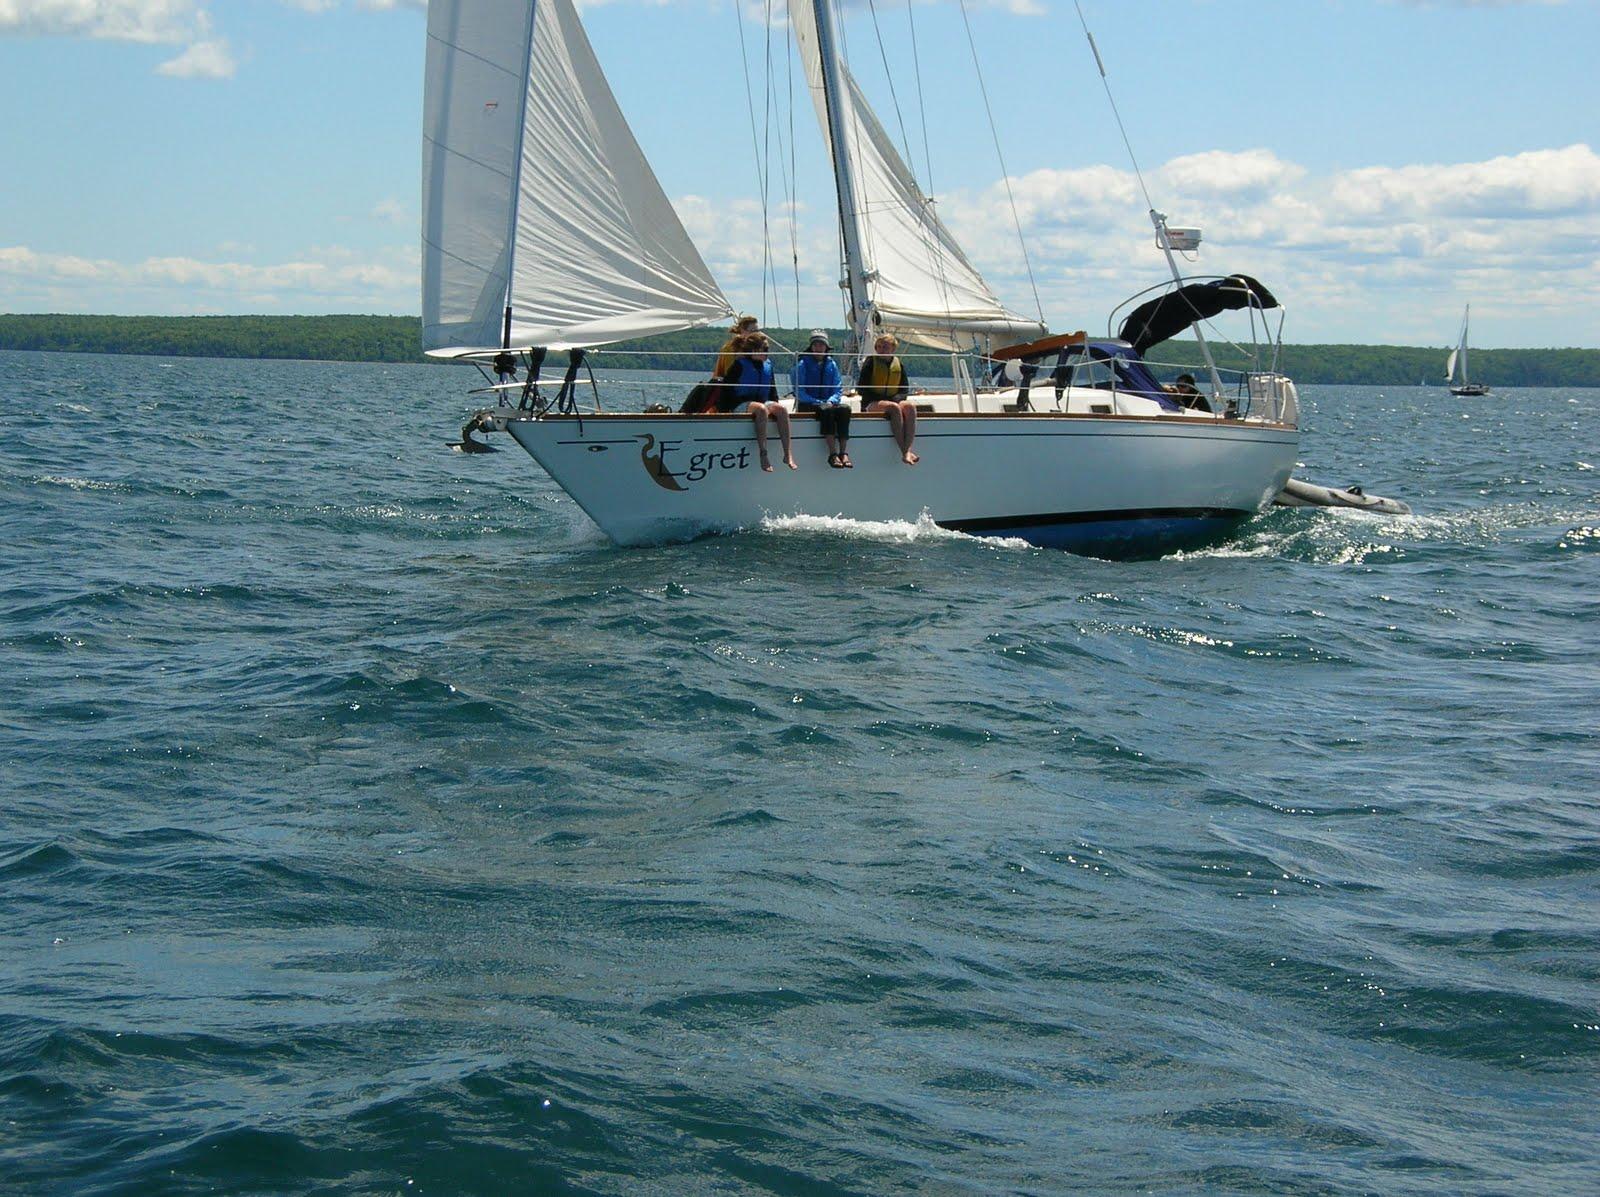 Teen sailing trips